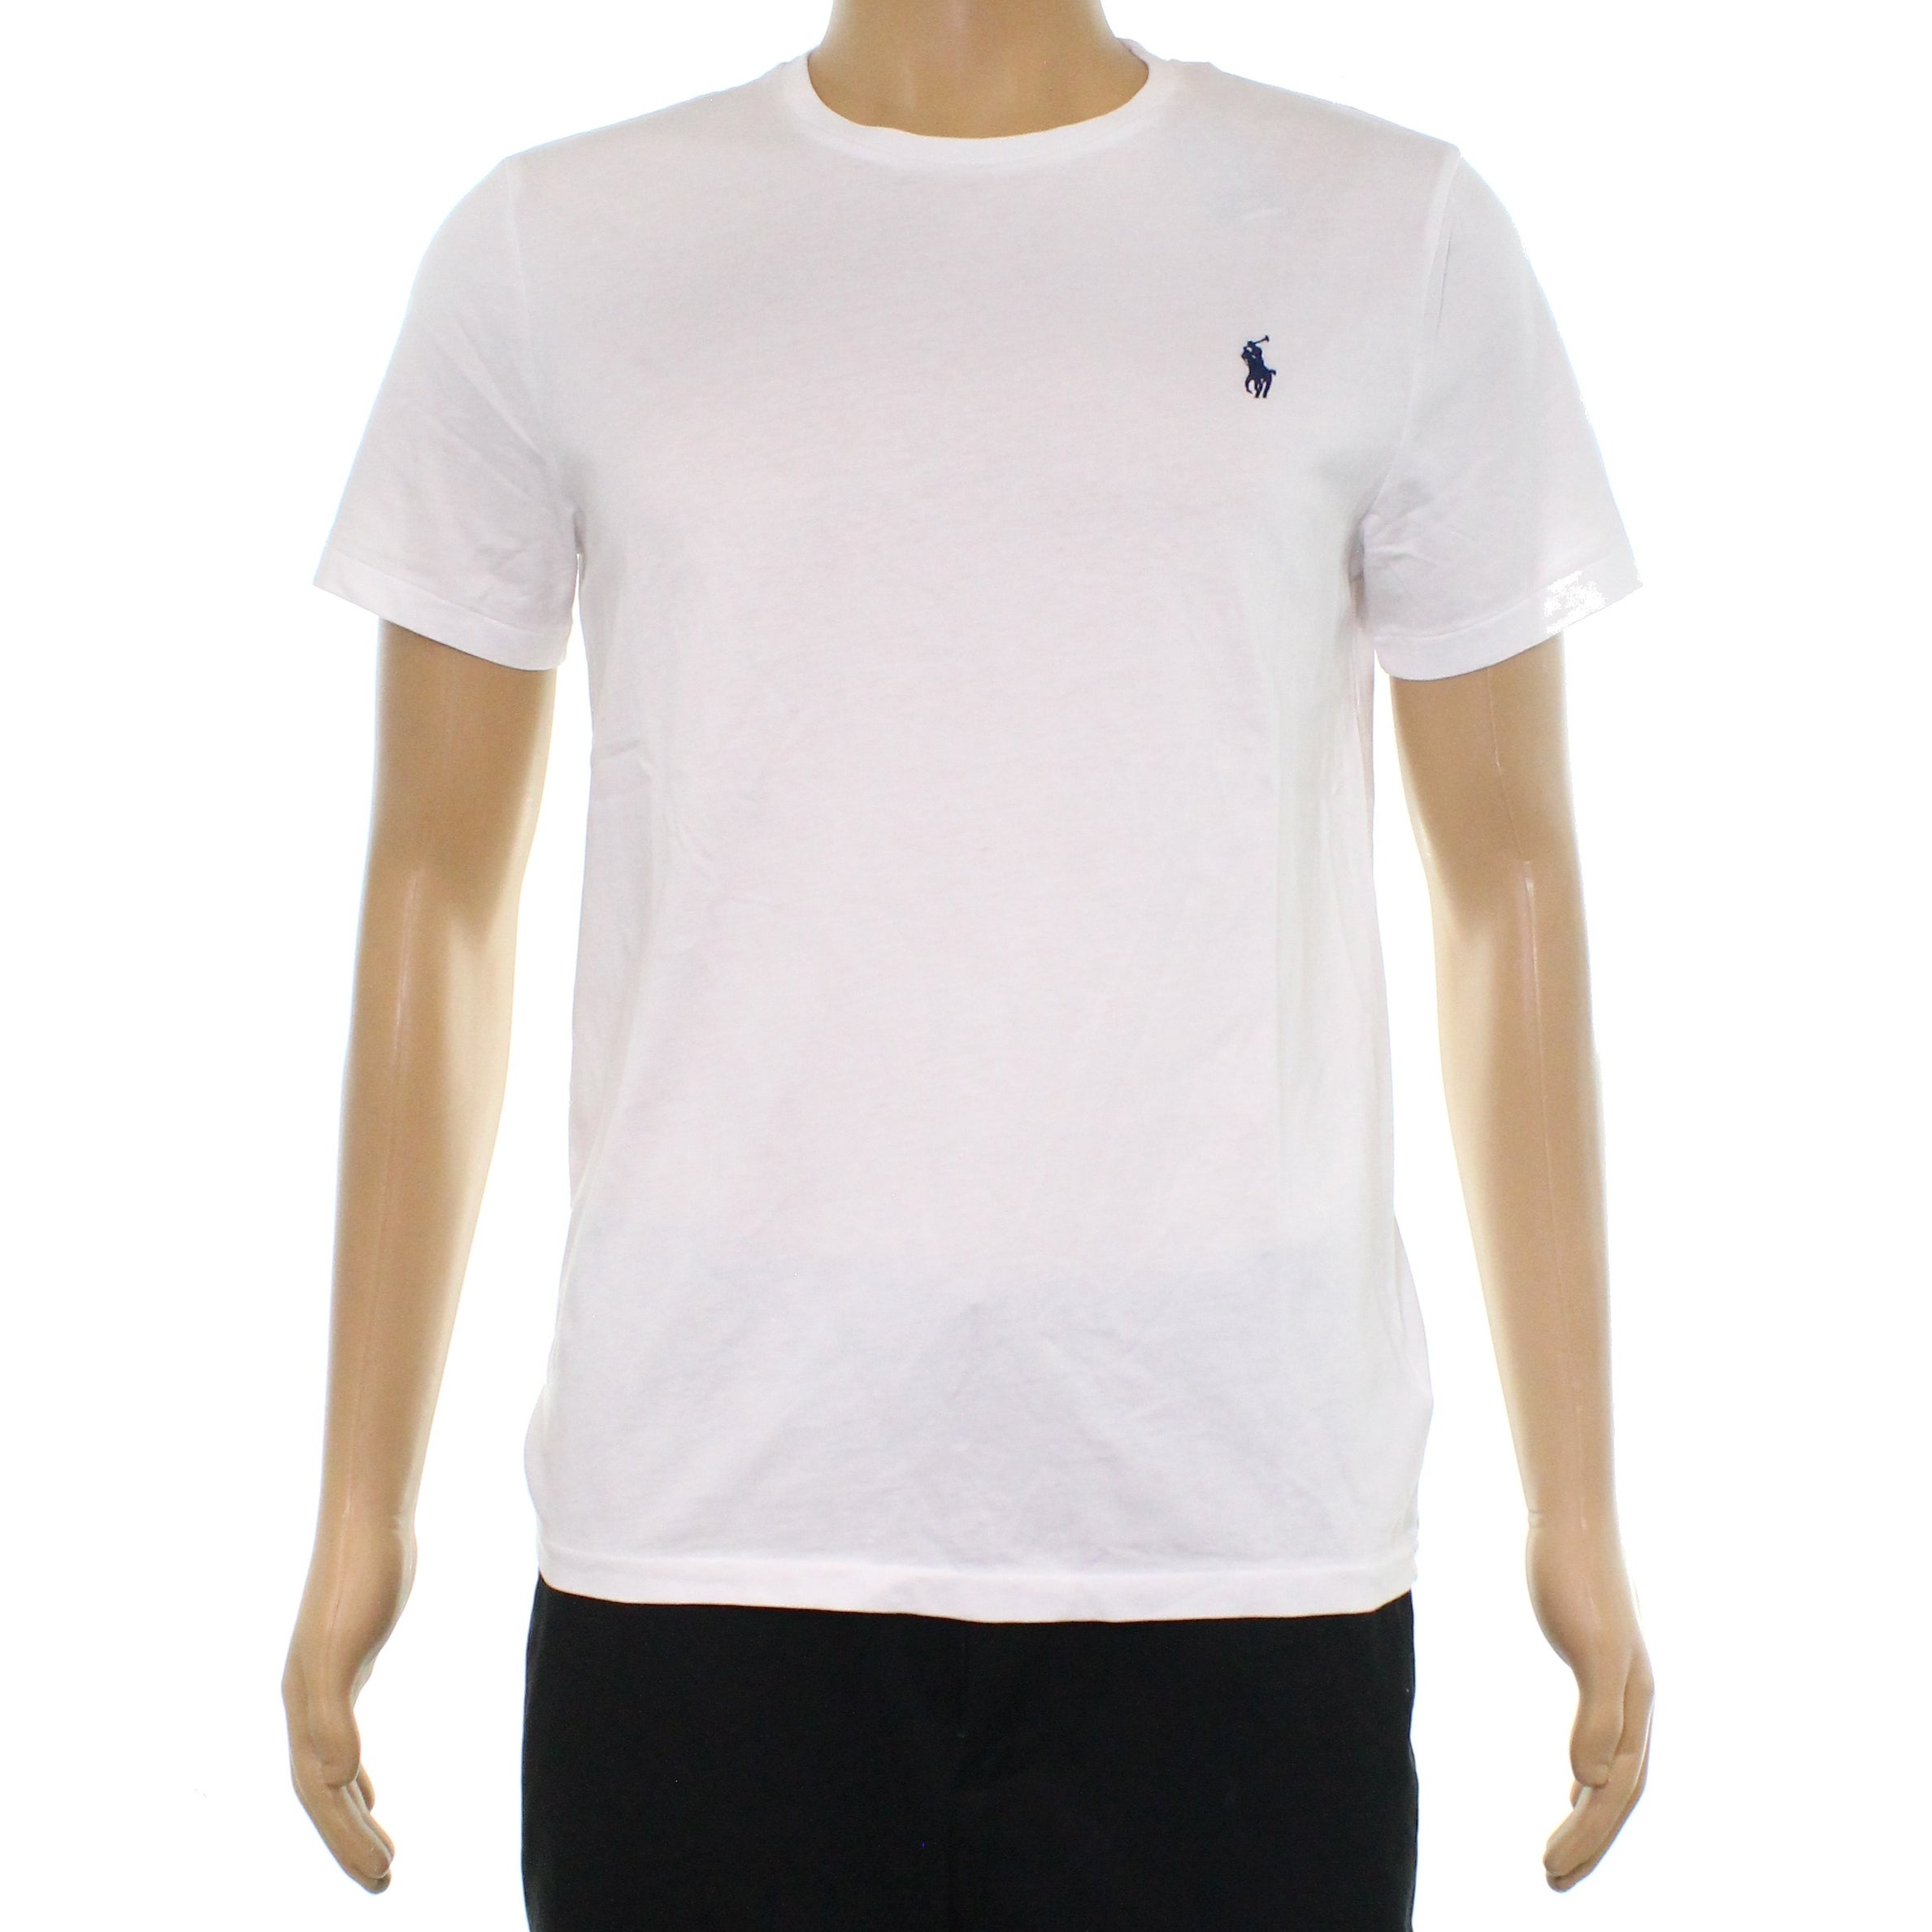 Shop Polo Ralph Lauren White Mens Size Medium M Crewneck Tee T Shirt